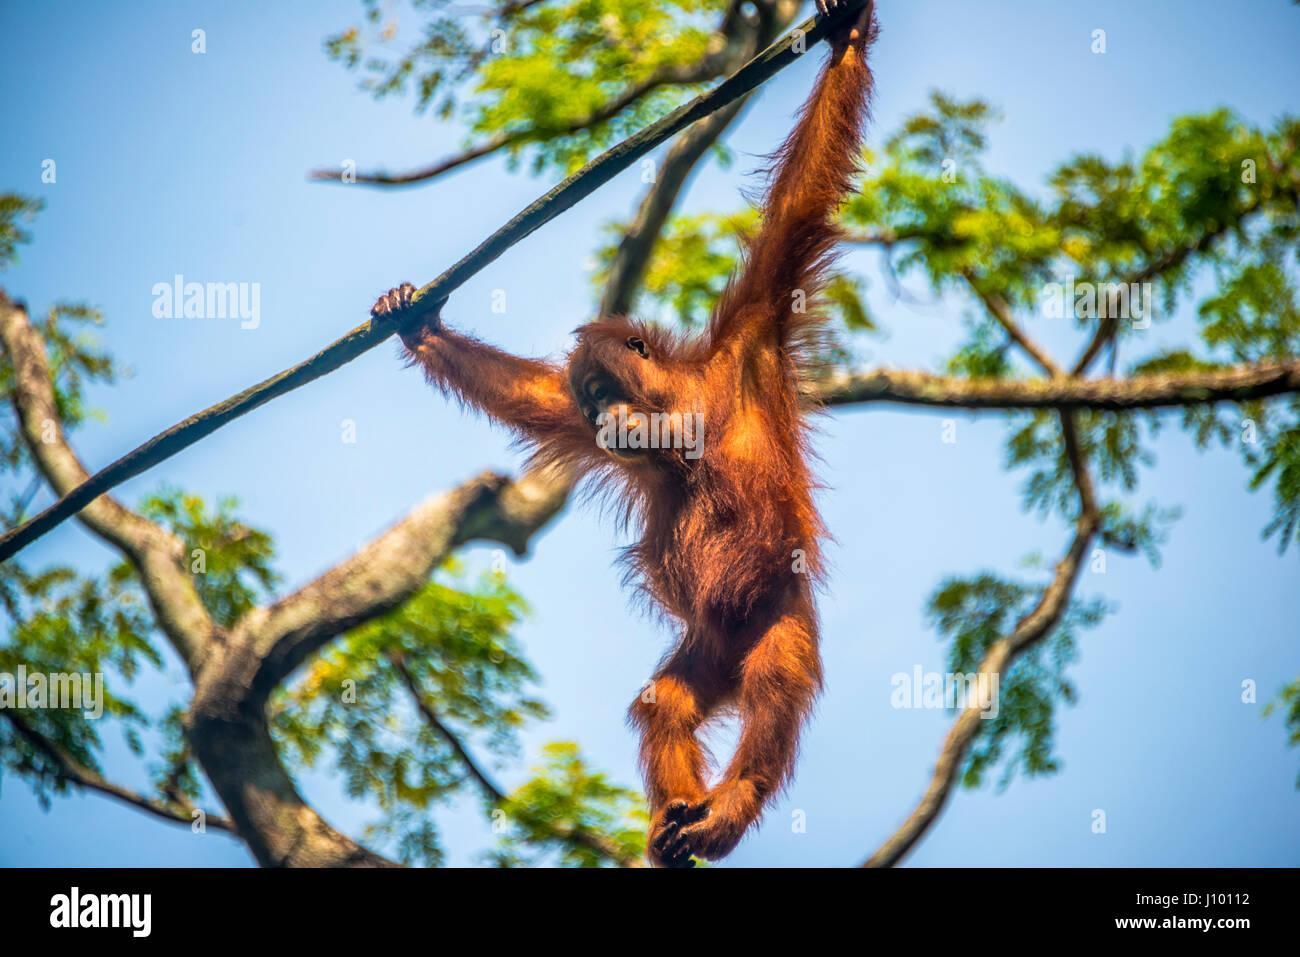 Bornean orangutan (Pongo pygmaeus), branchiation, climbing on a rope, captive, Singapore Zoo, Singapore - Stock Image